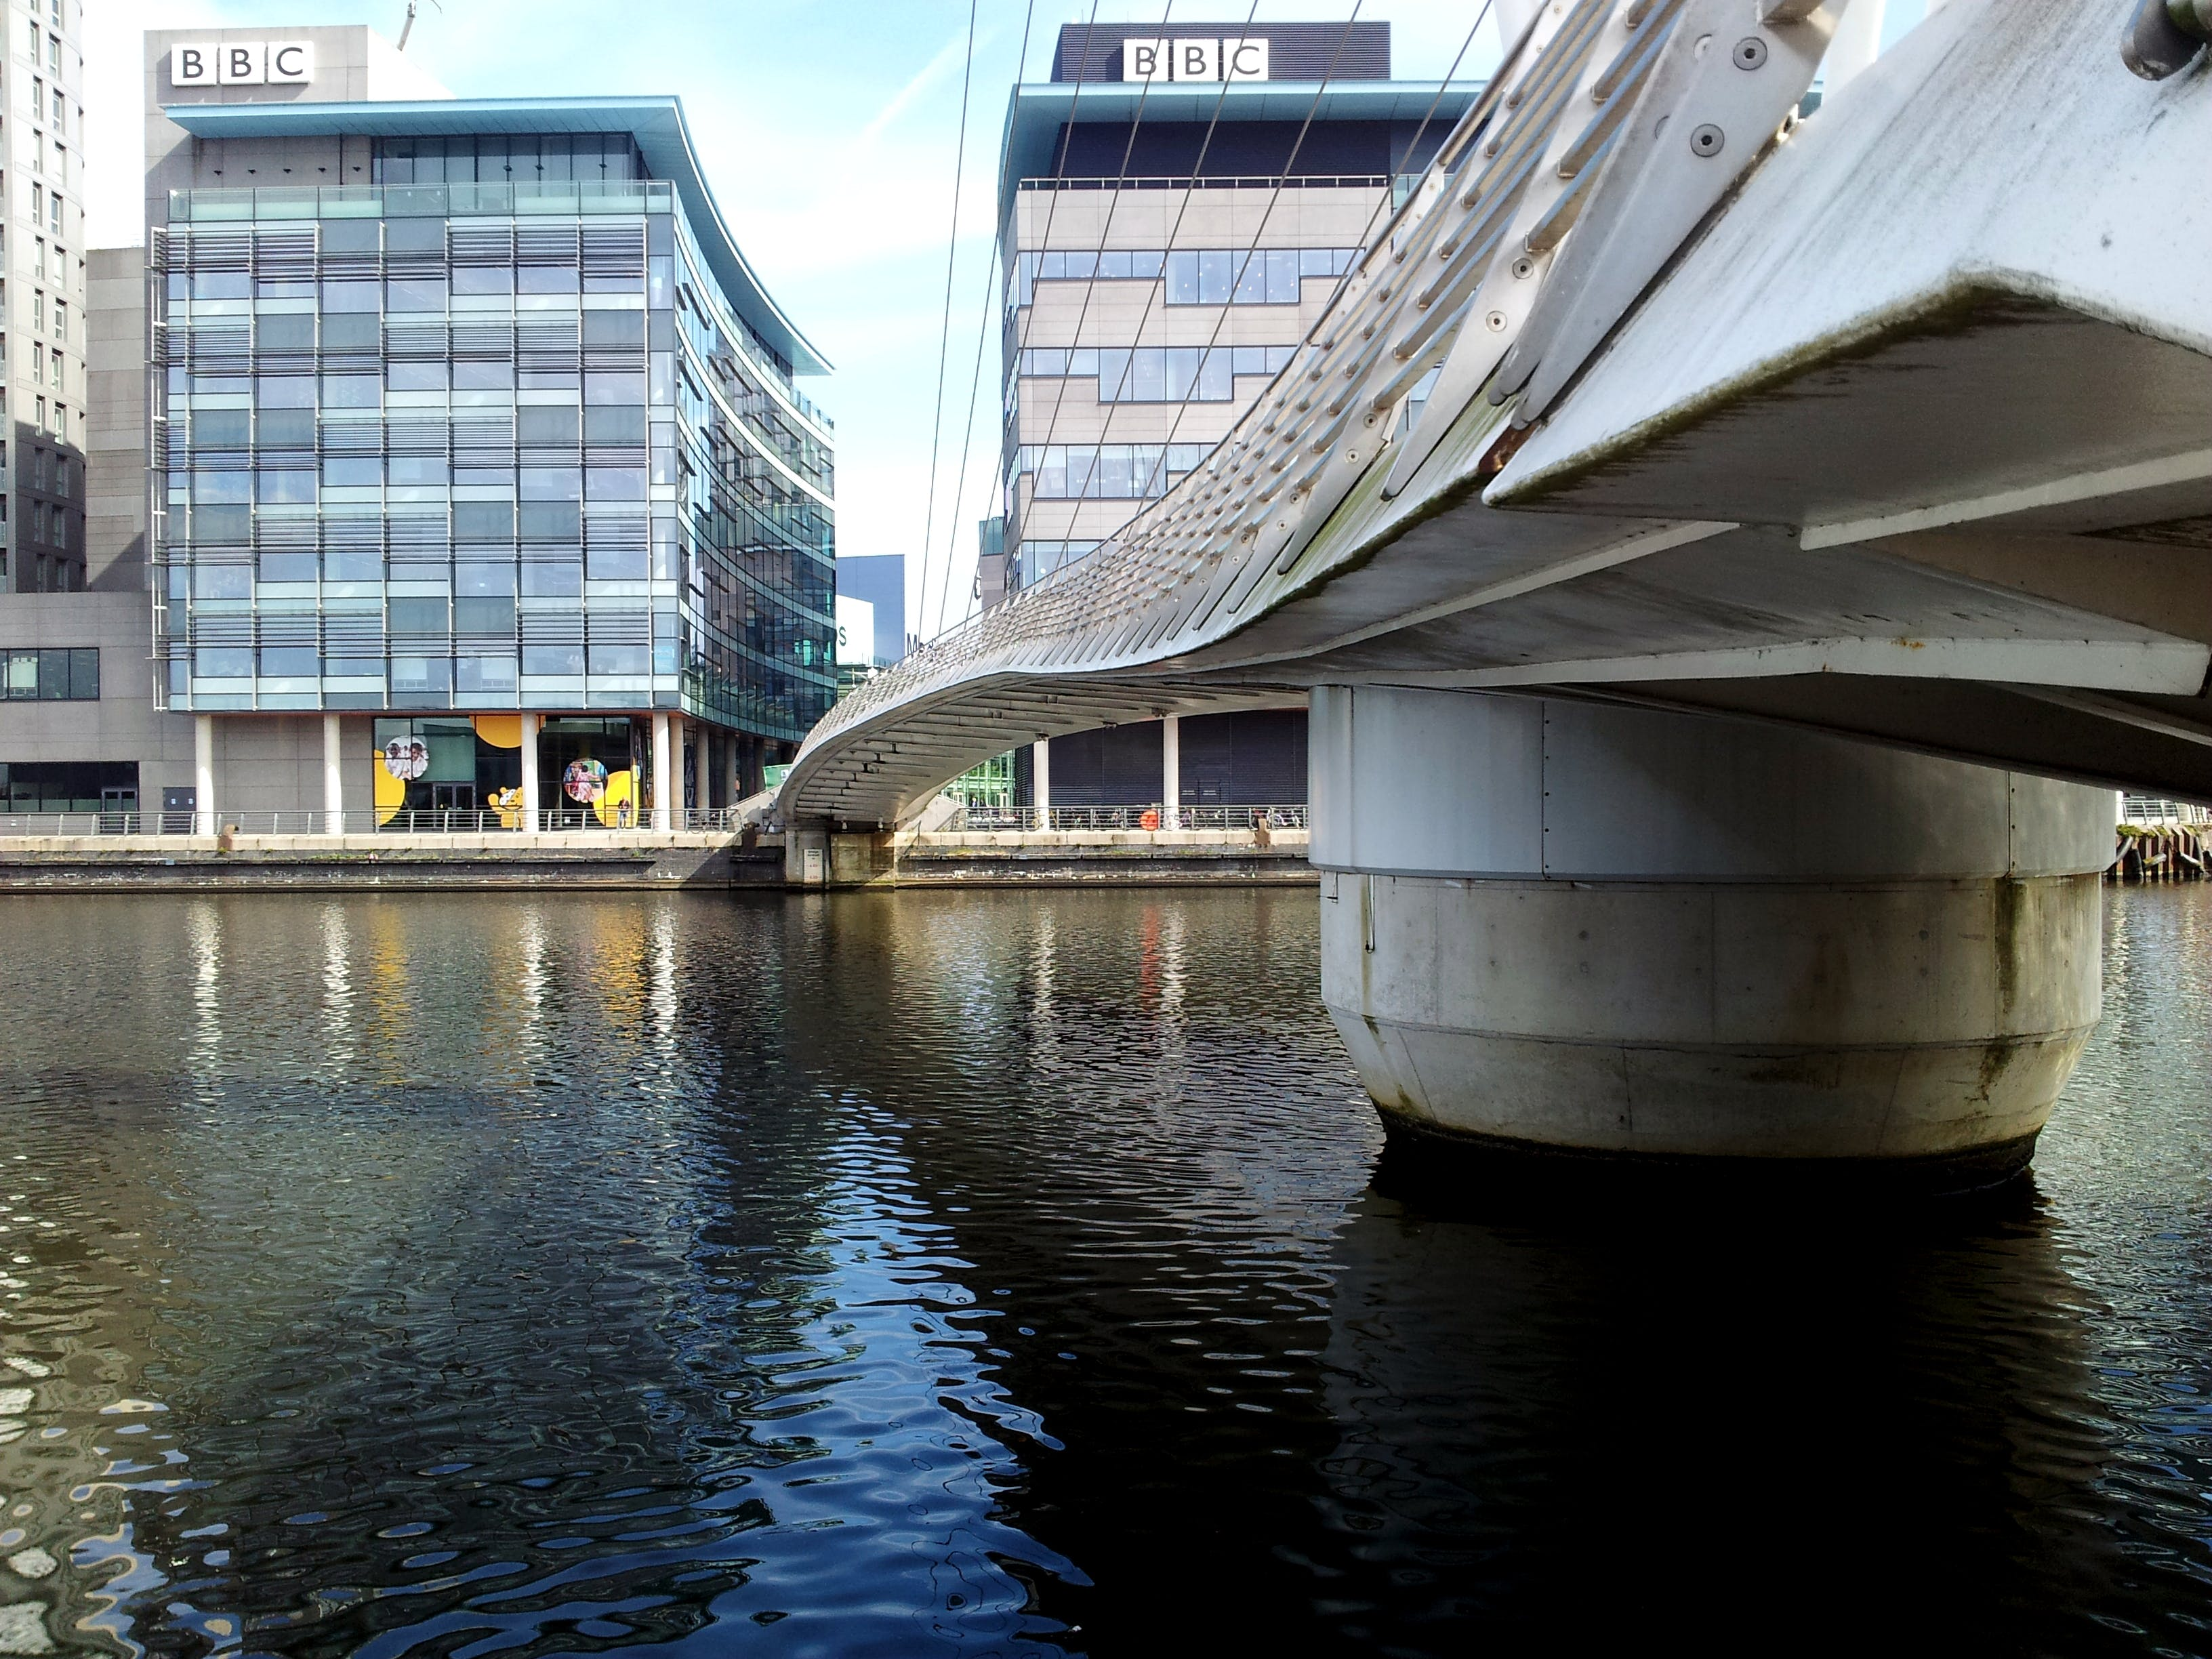 Gratis arkivbilde med arkitektur, bro, bygning, eksteriør